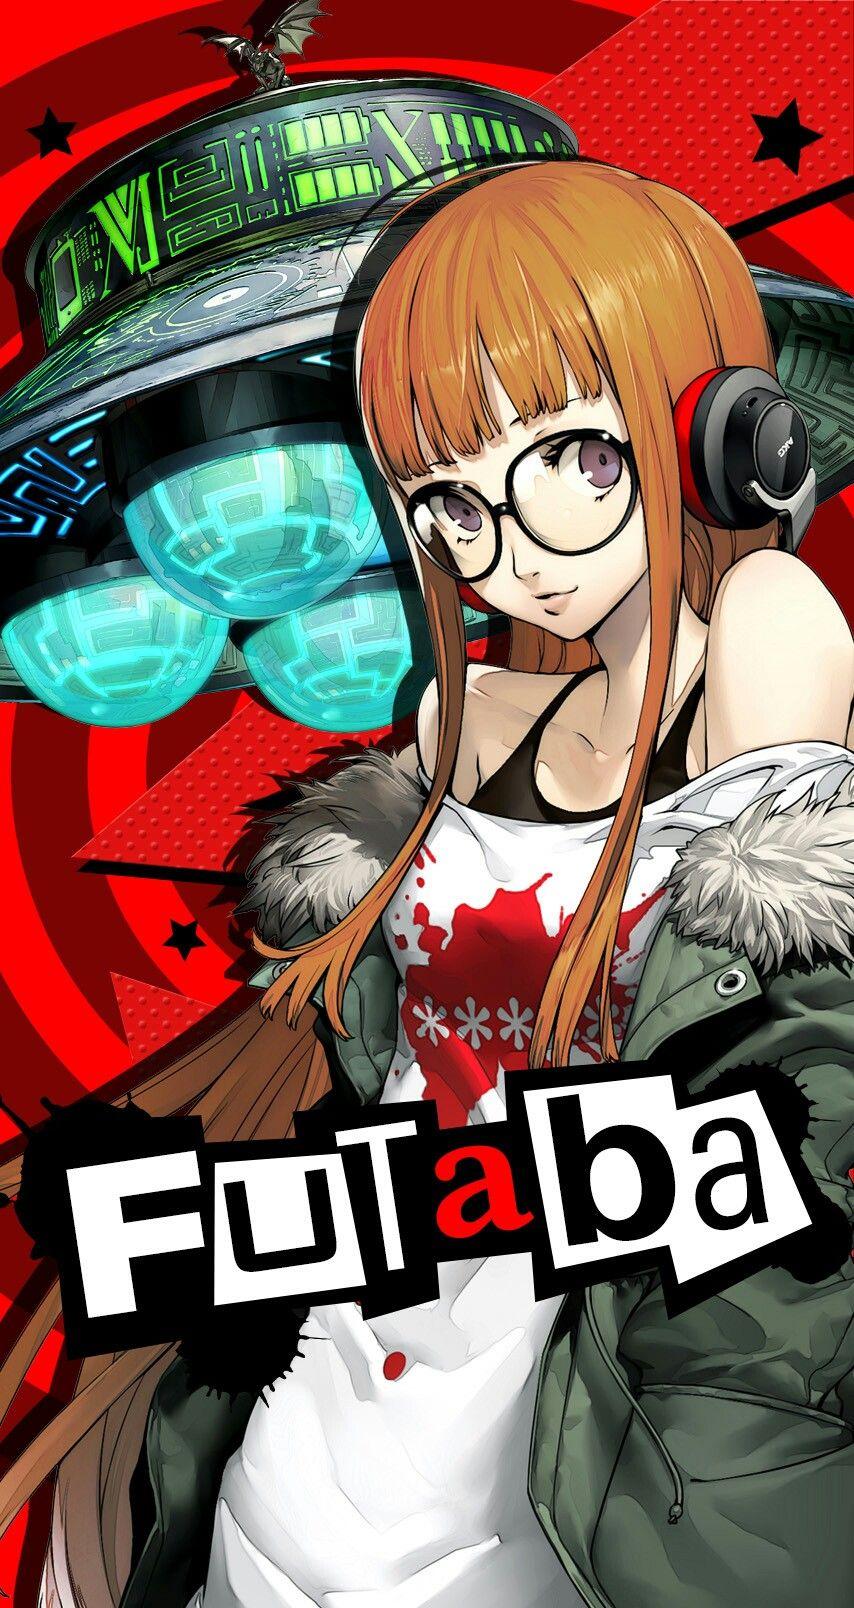 Persona 5 Futaba Sakura Wallpaper Persona 5 Anime Persona 5 Persona 5 Joker